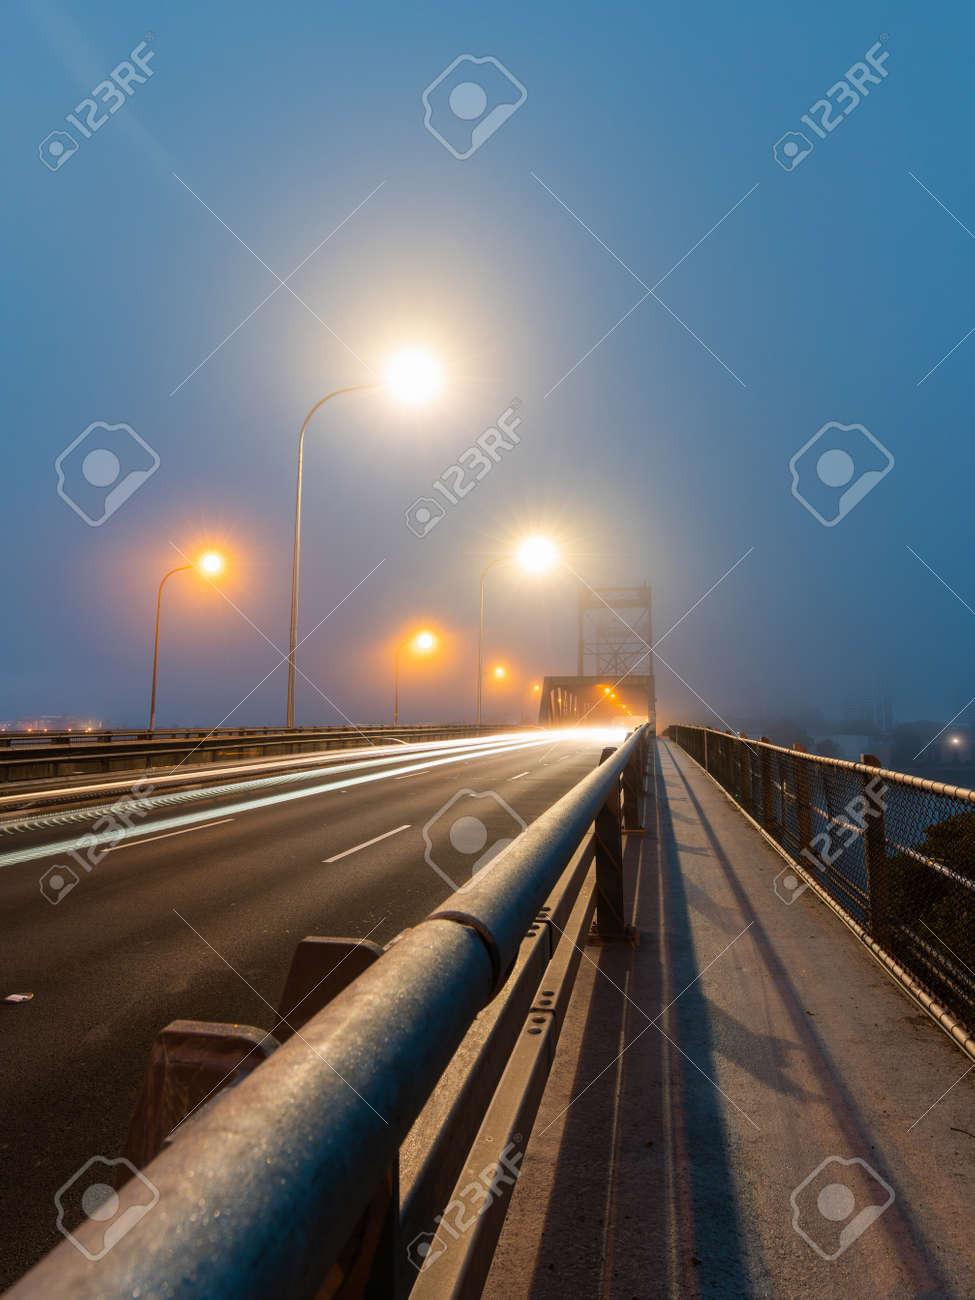 Car driving through fog at Ryde Bridge, Sydney, Australia. - 169167954